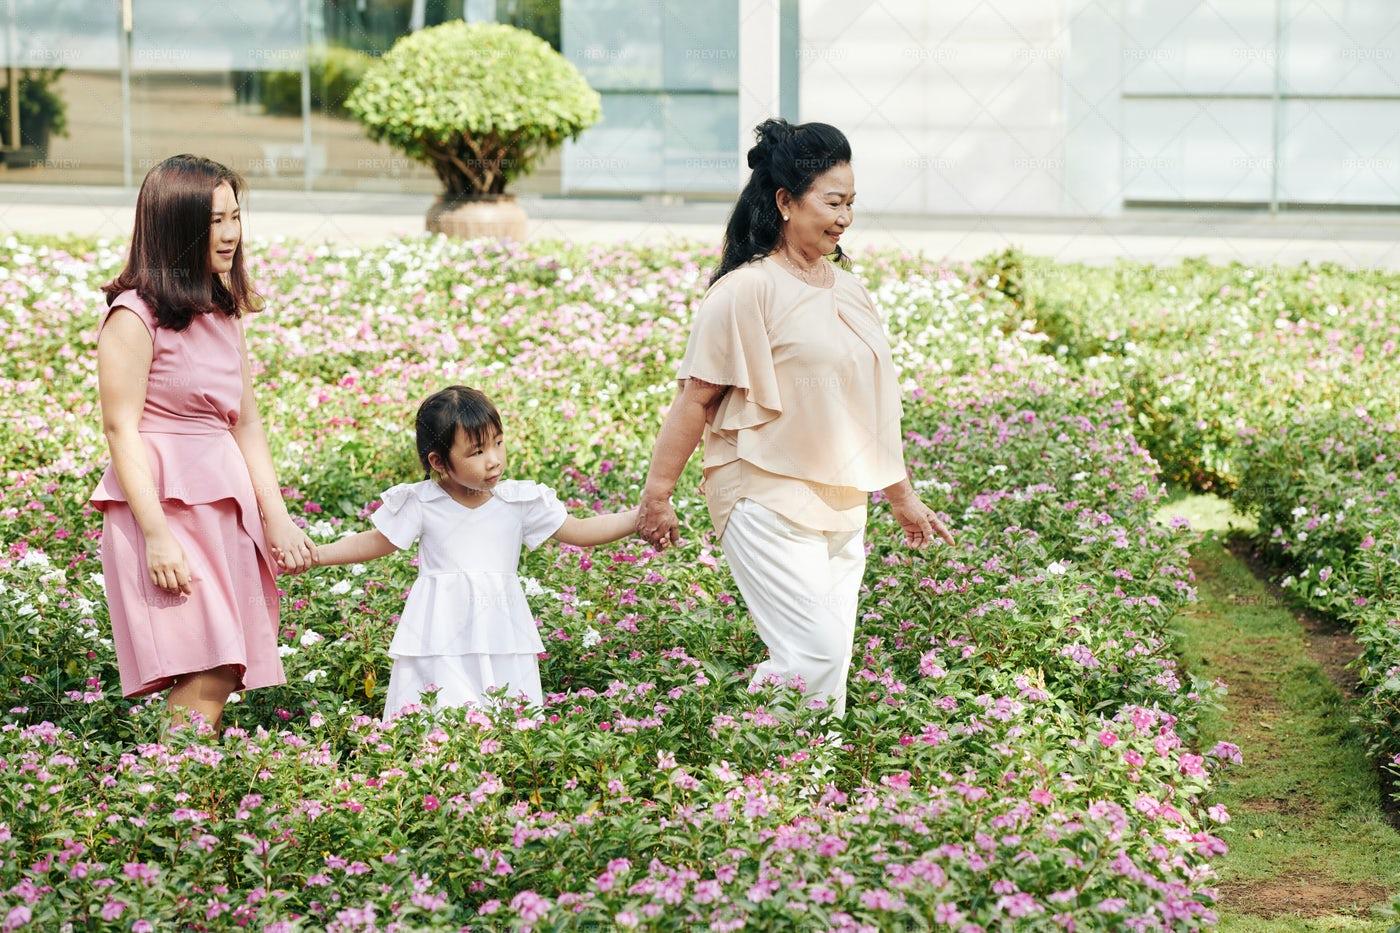 Family Walking In Park: Stock Photos